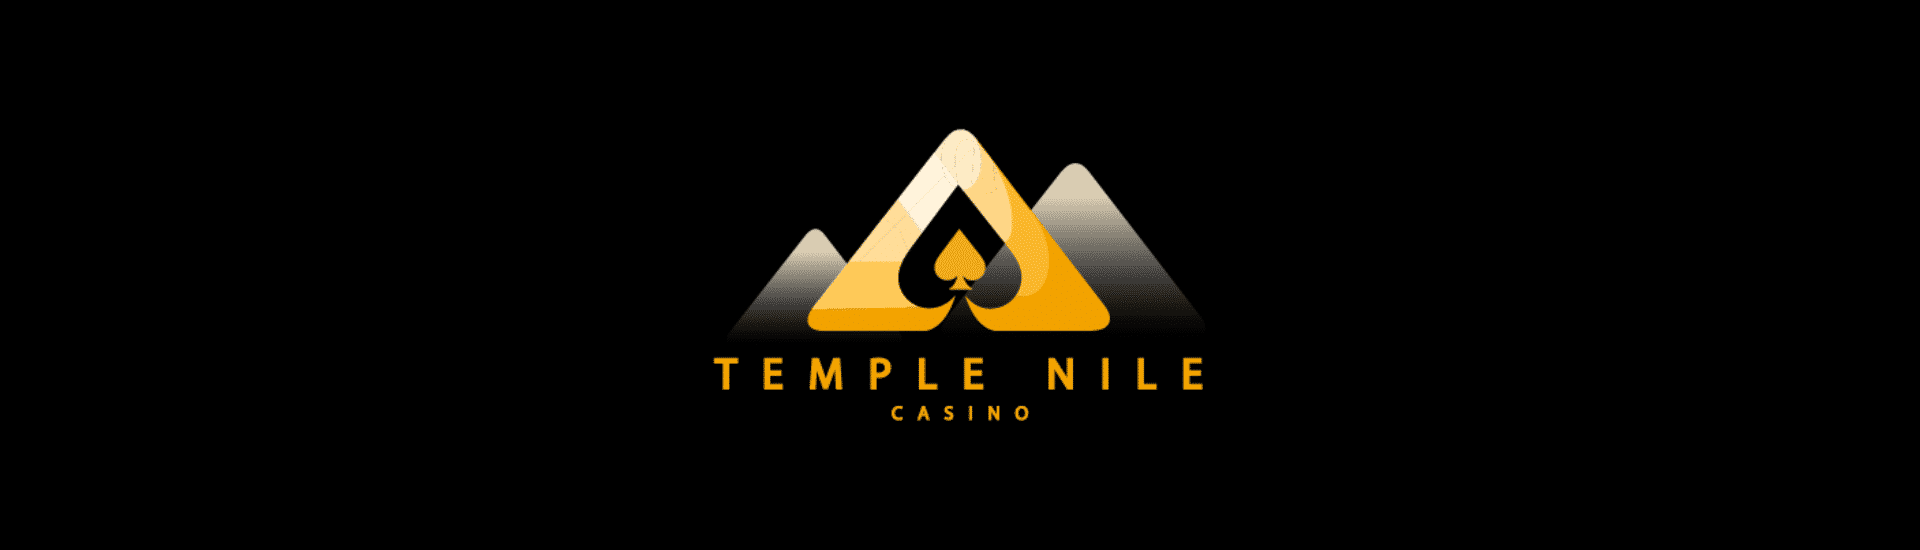 Temple Nile Featured Image